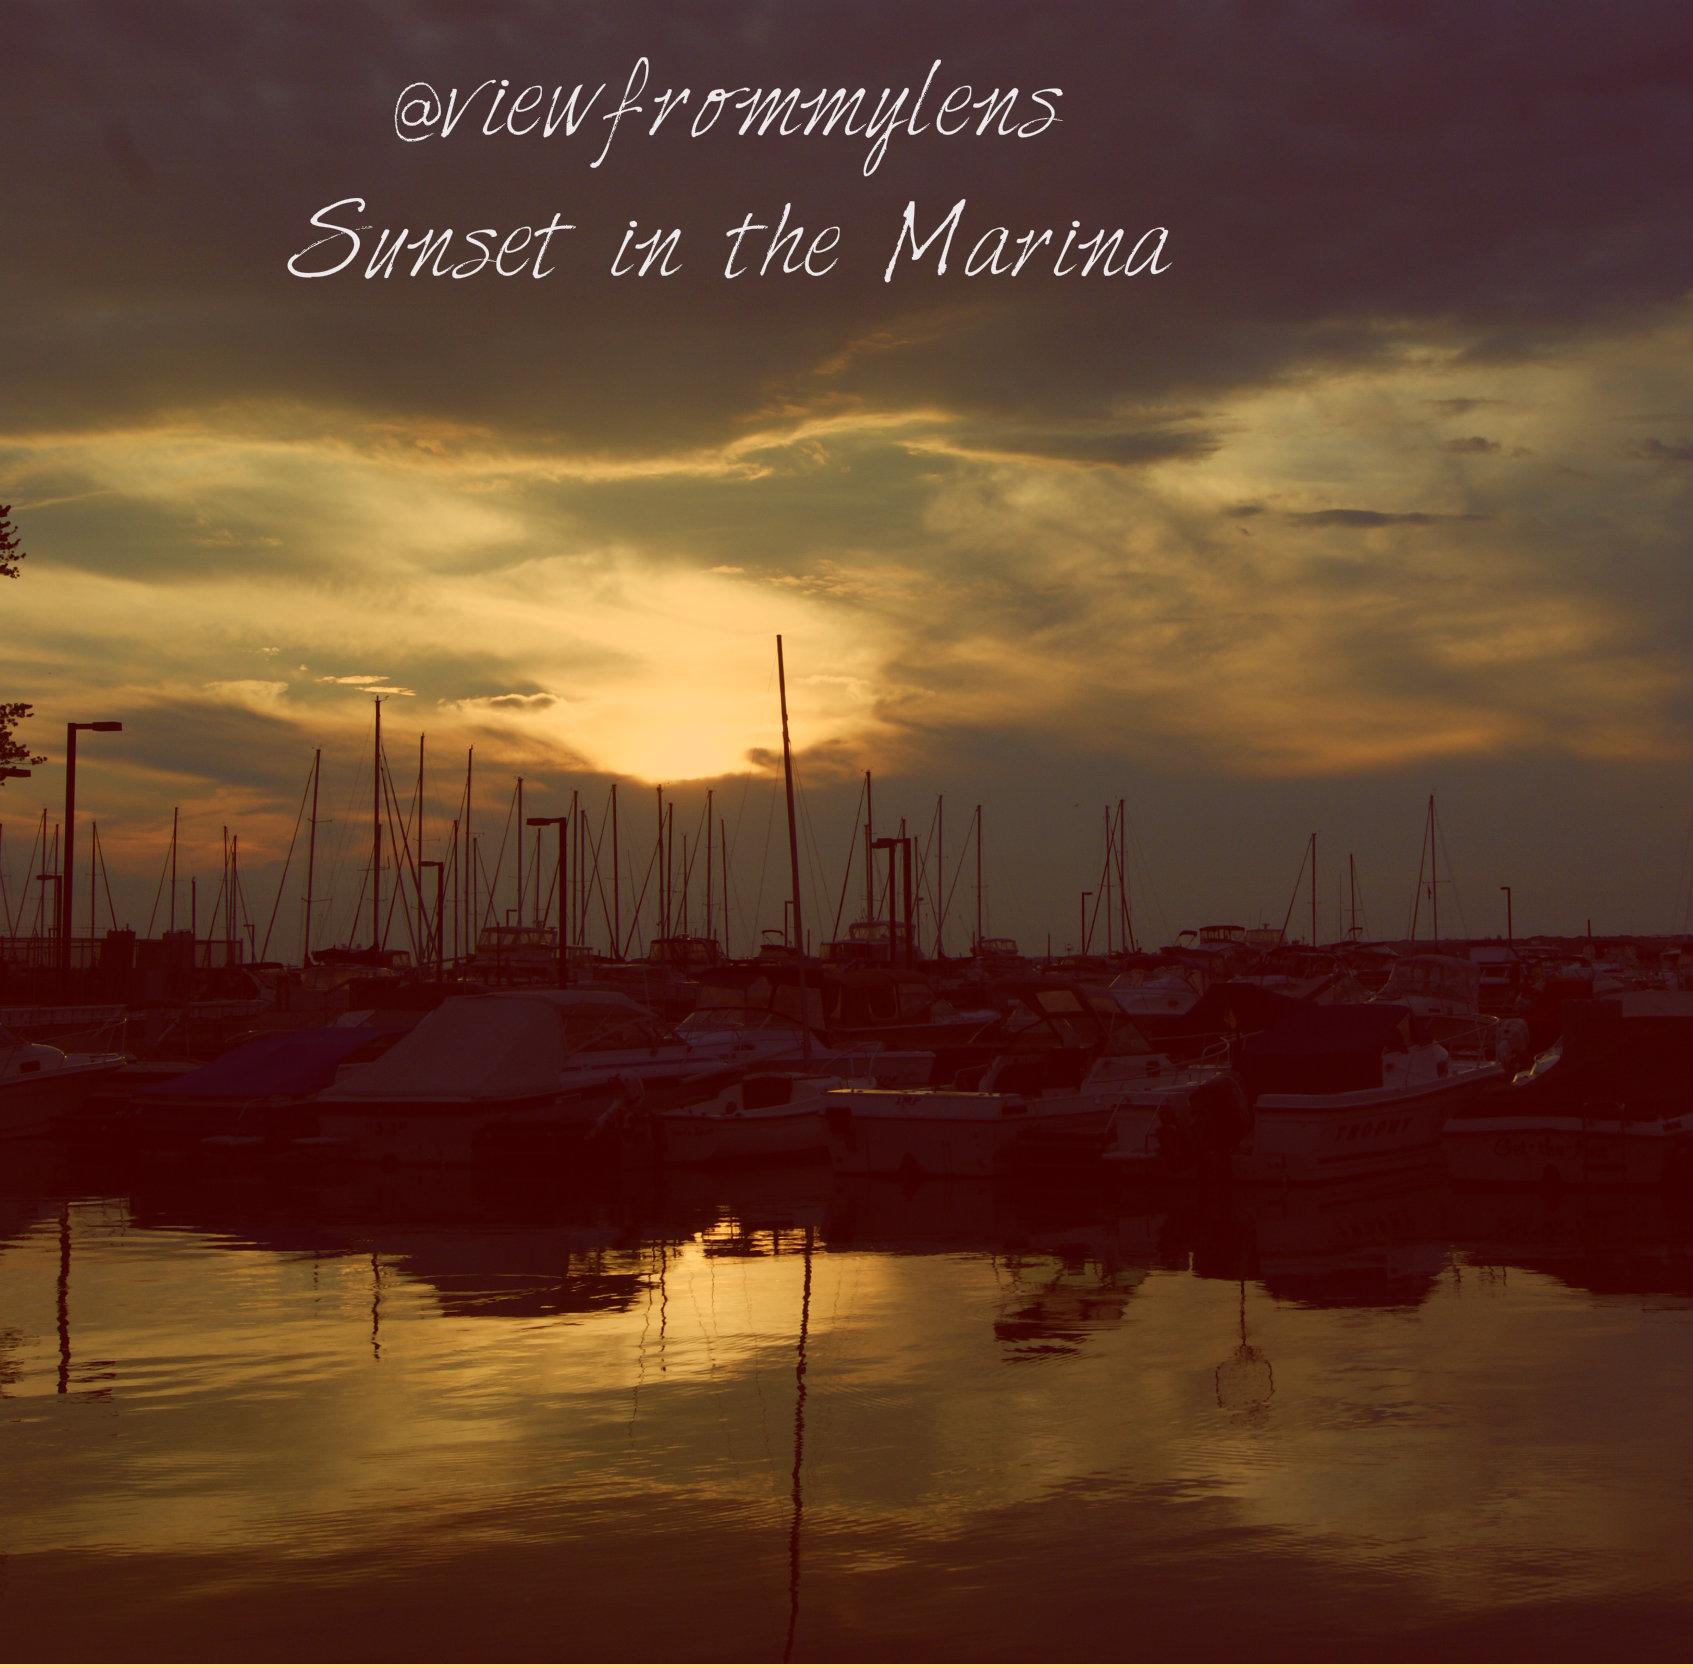 Sunset in the Marina #187